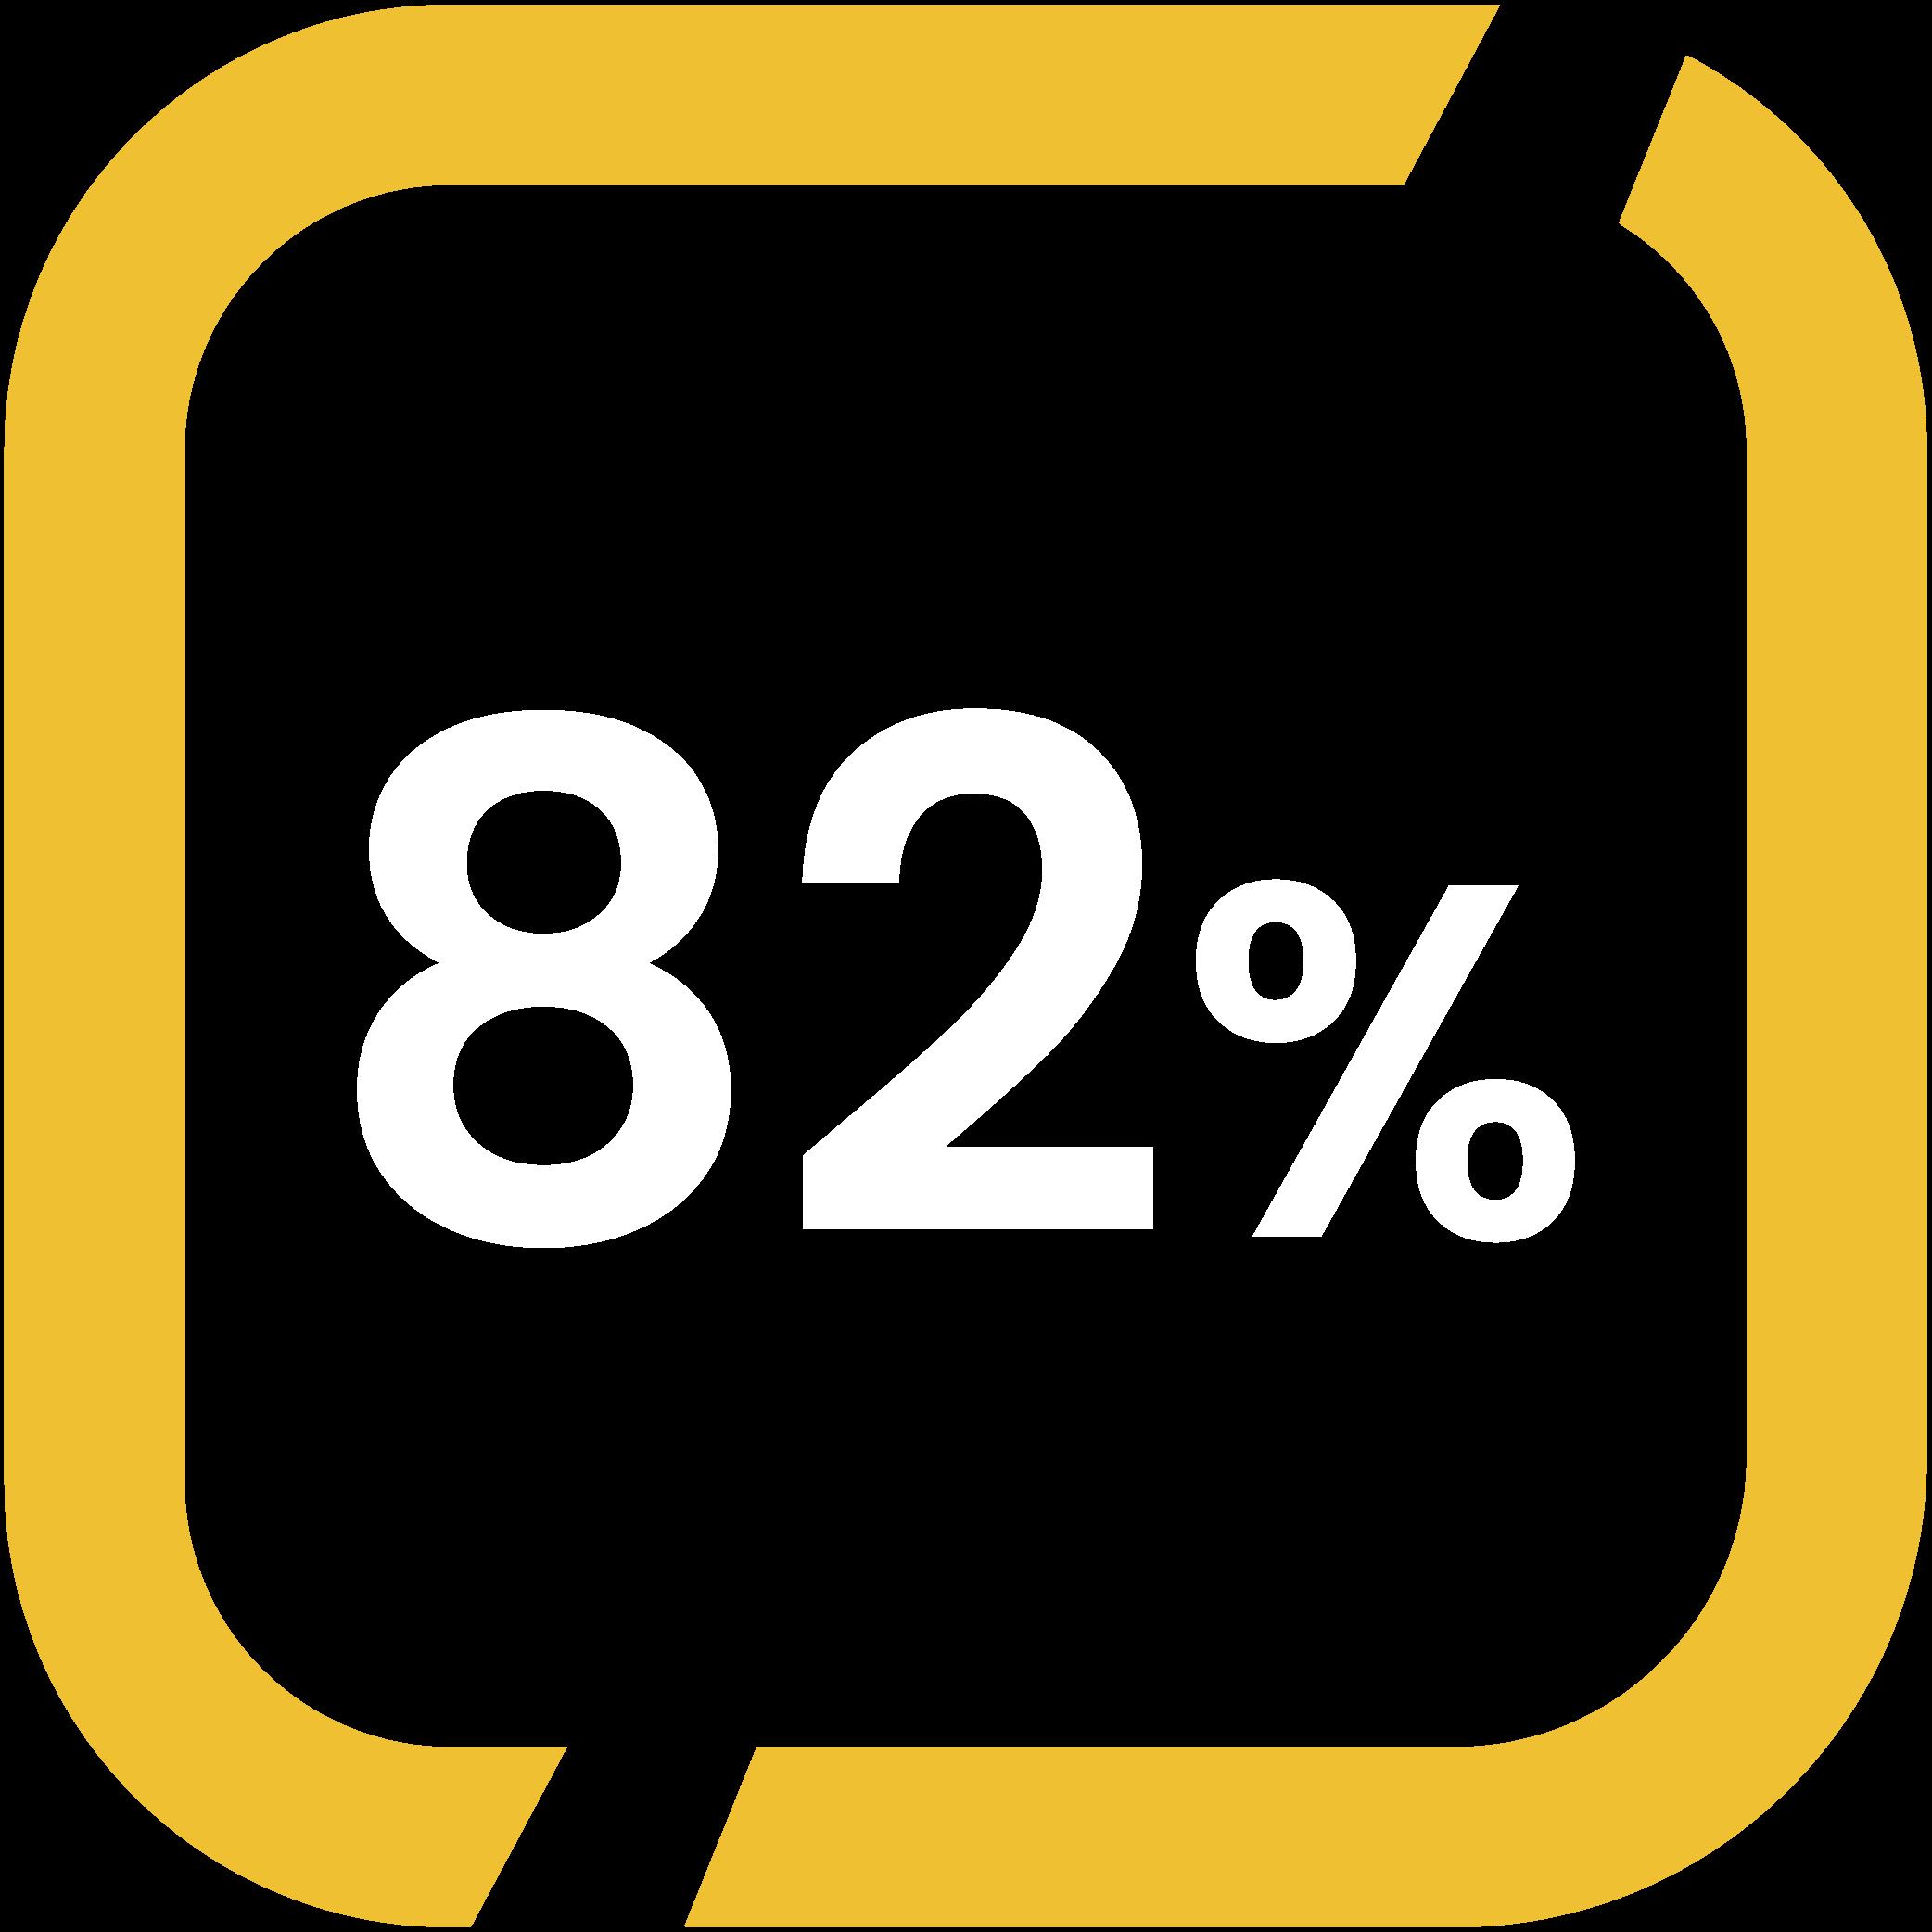 82% of B2B organisation use case studies